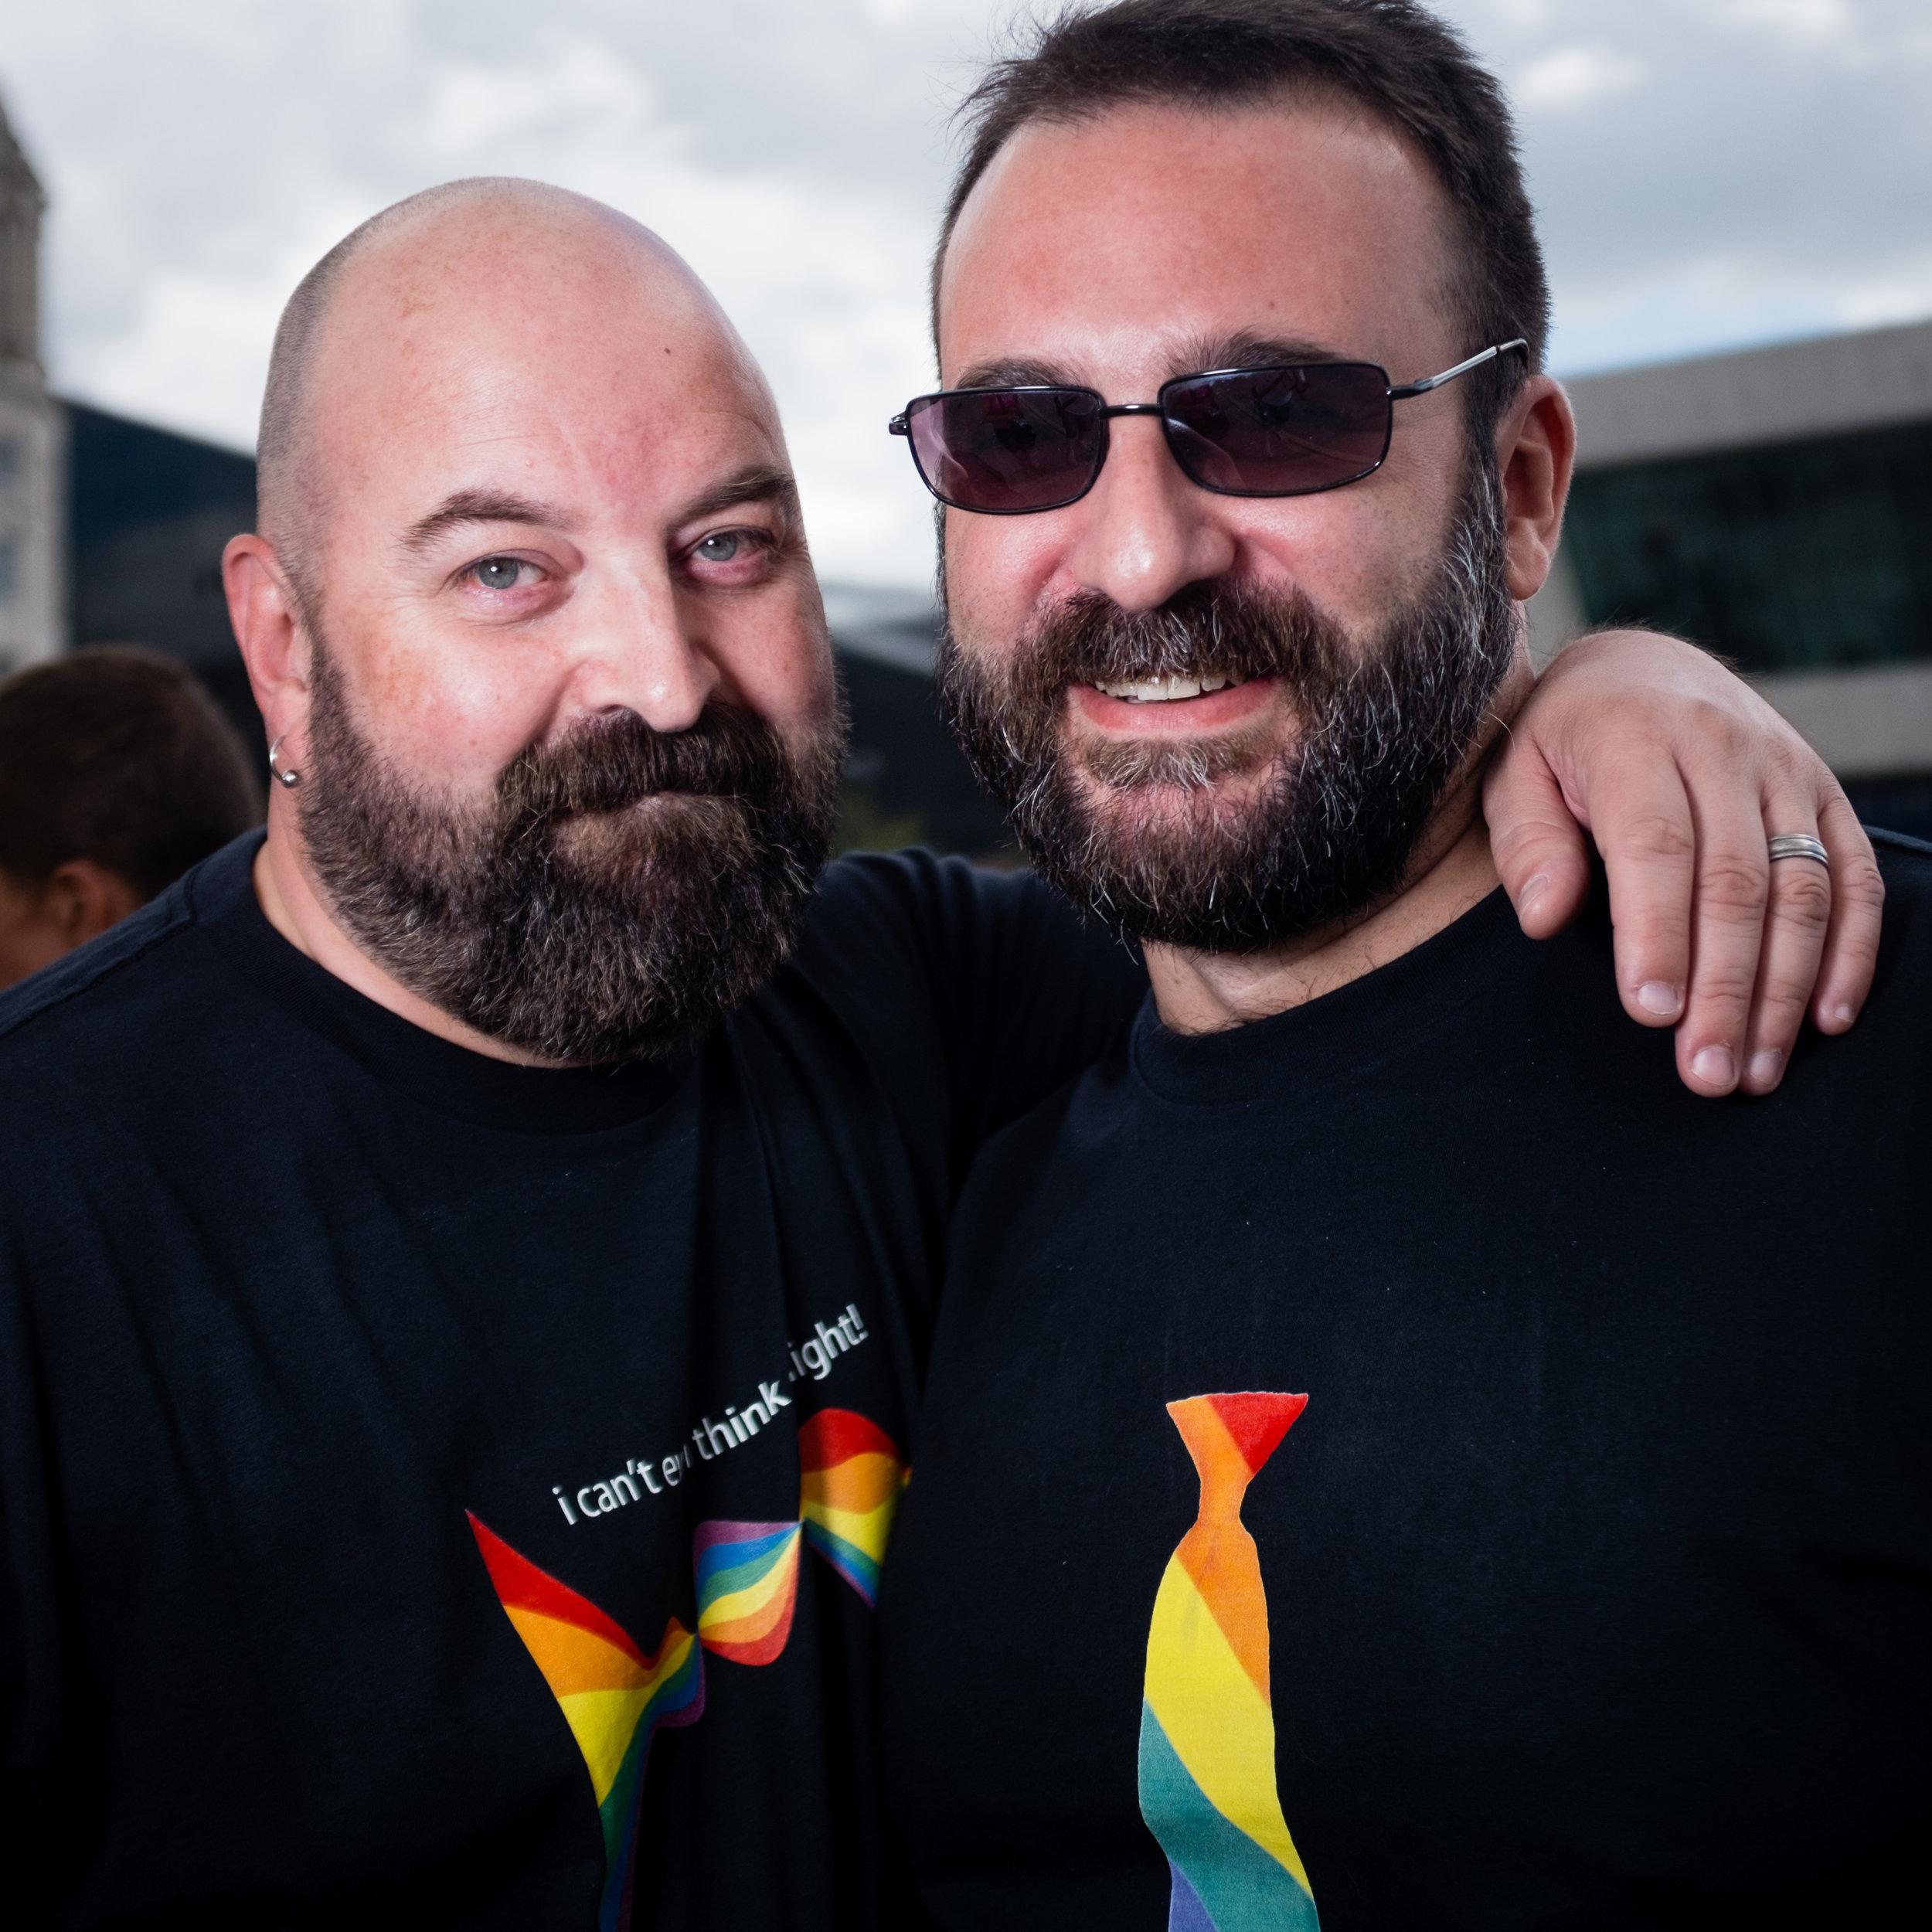 liverpool-pride-2013-5864-pete-carr.jpg